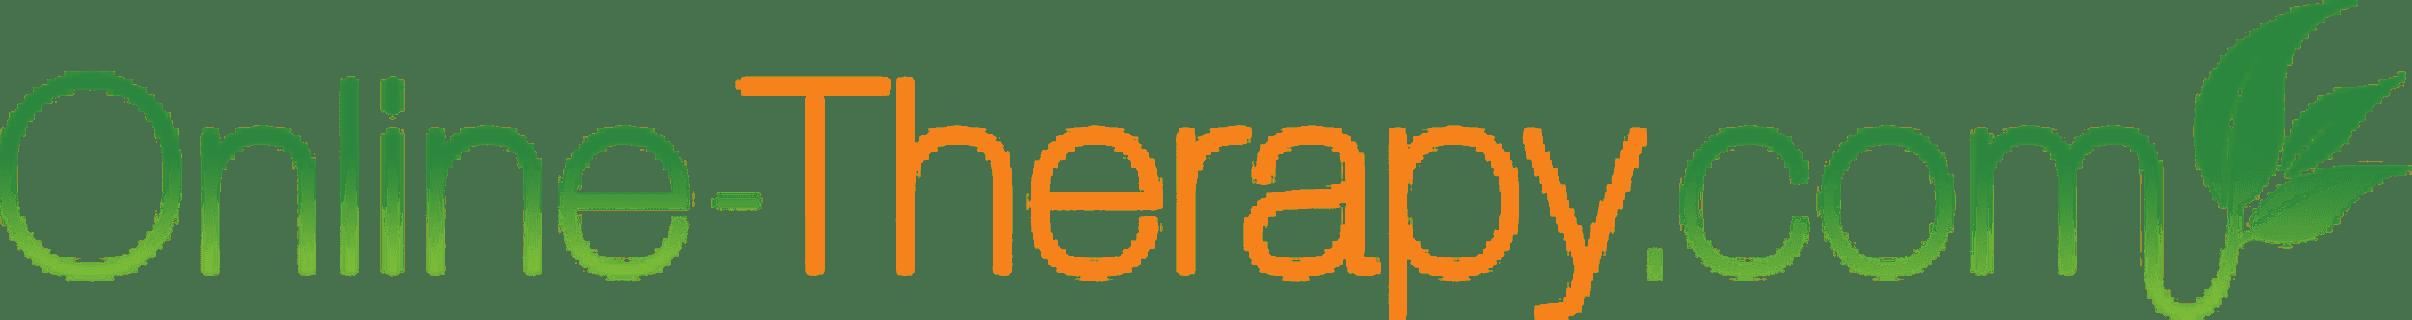 Online-Therapy.com logo